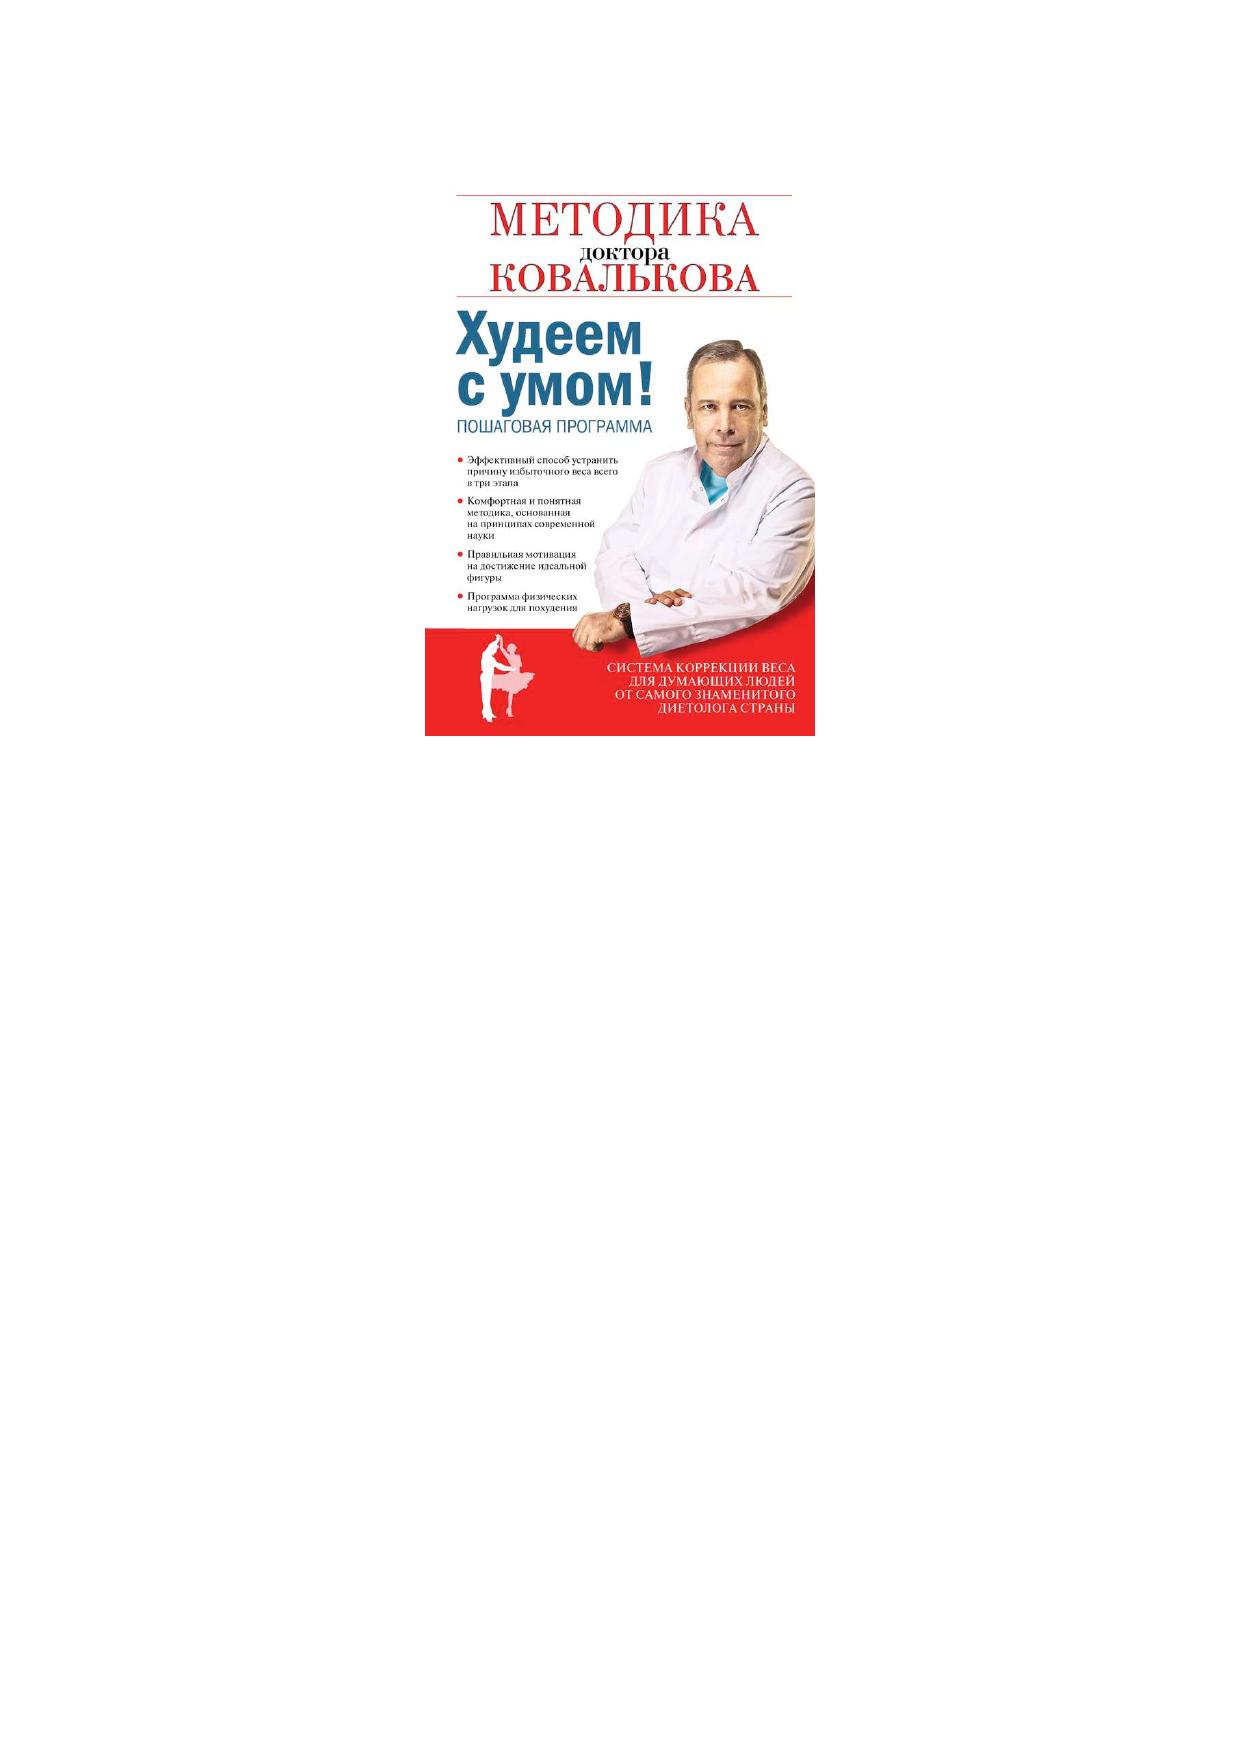 https://cdn.eksmo.ru/v2/ITD000000000216999/PDF/ITD000000000216999-01.png